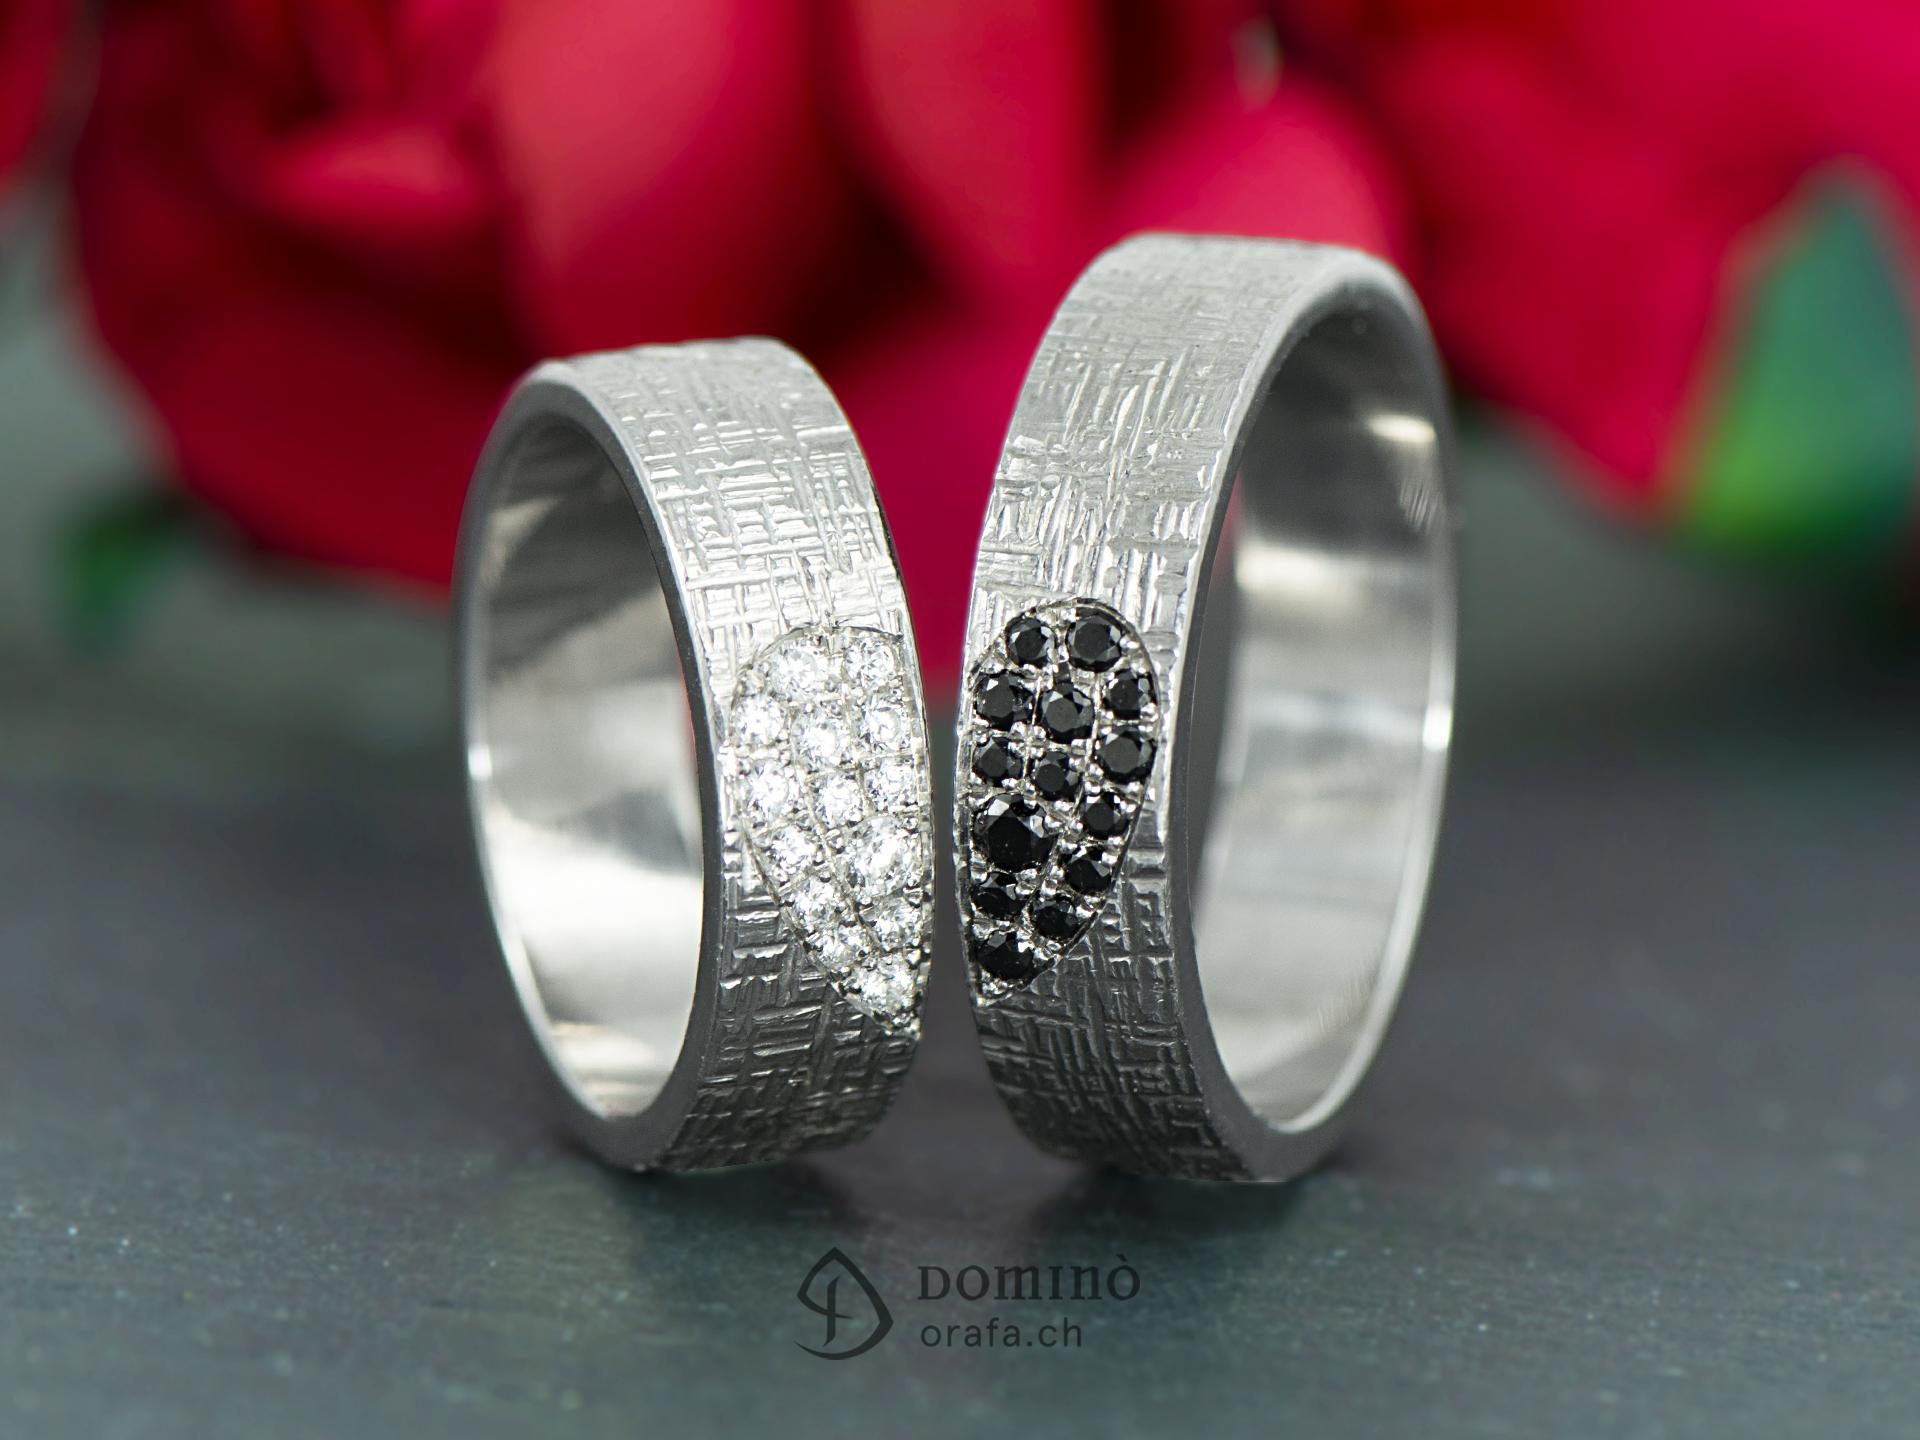 fedi-nuziali-linee-incrociate-cuore-diamanti-incolore-neri-1